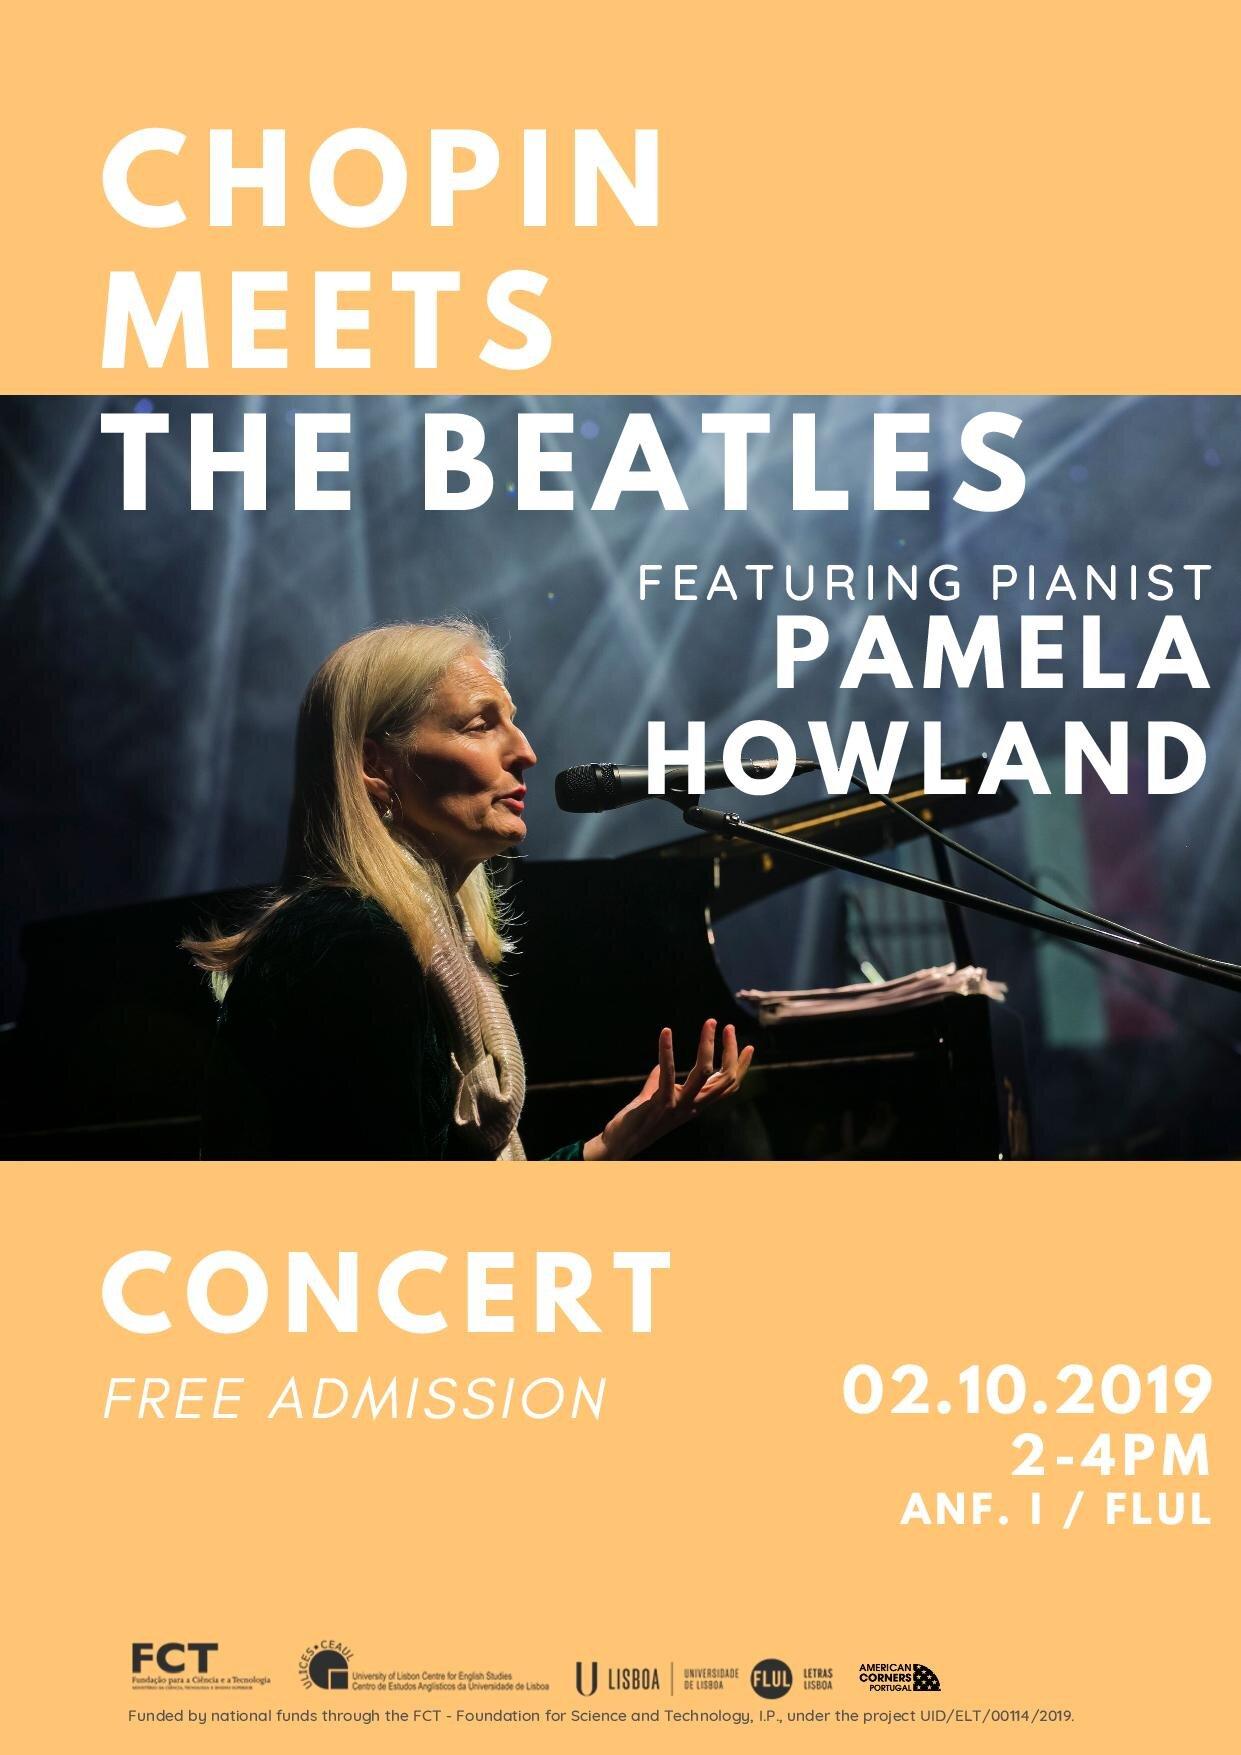 Portual concert poster.jpg